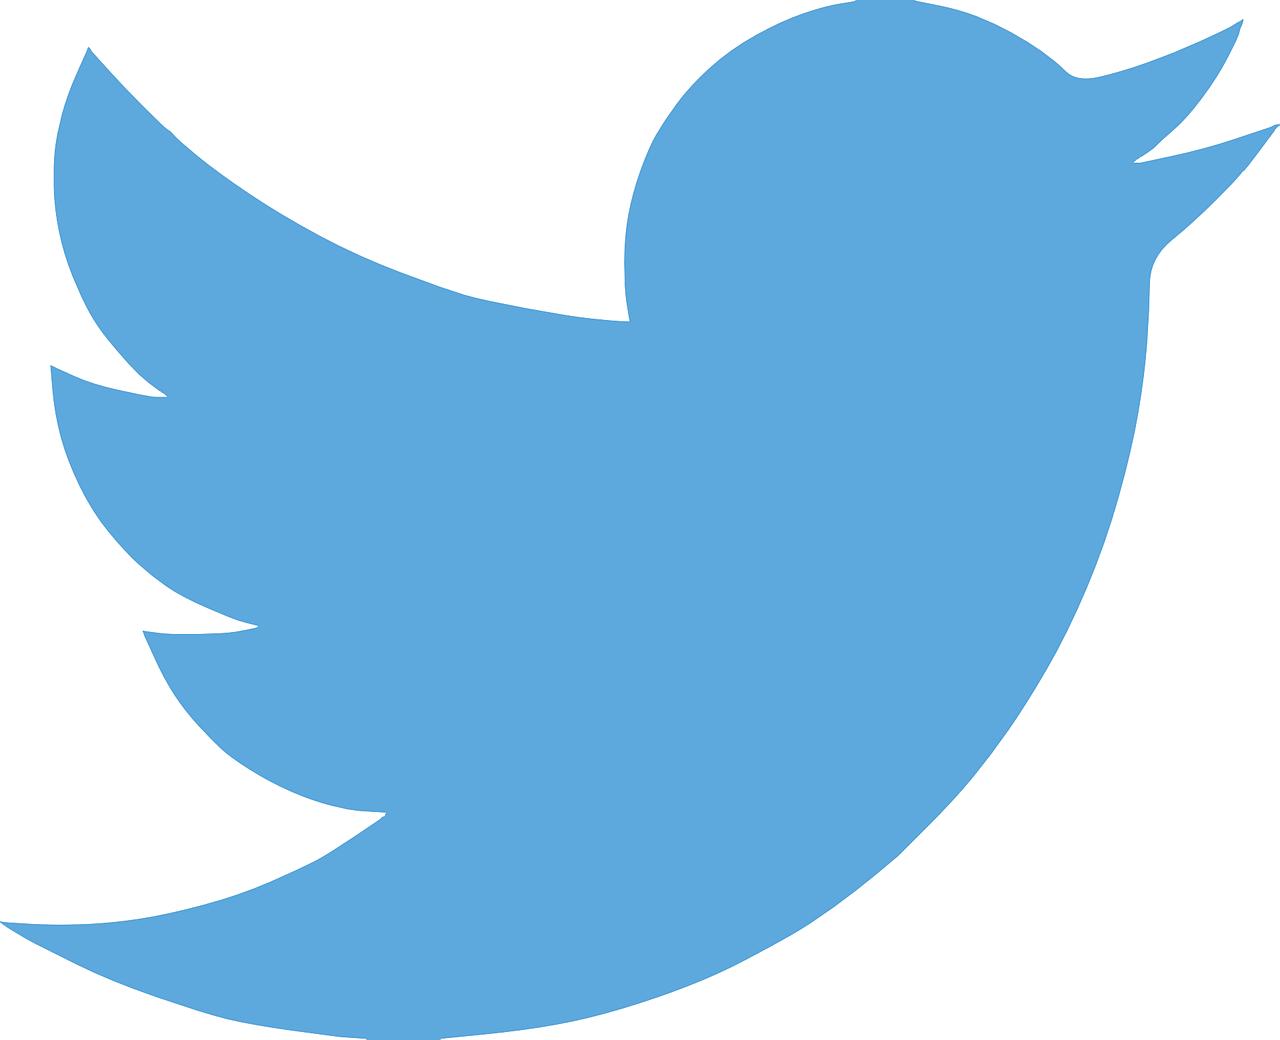 http://pixabay.com/fr/twitter-tweet-oiseau-de-twitter-312464/